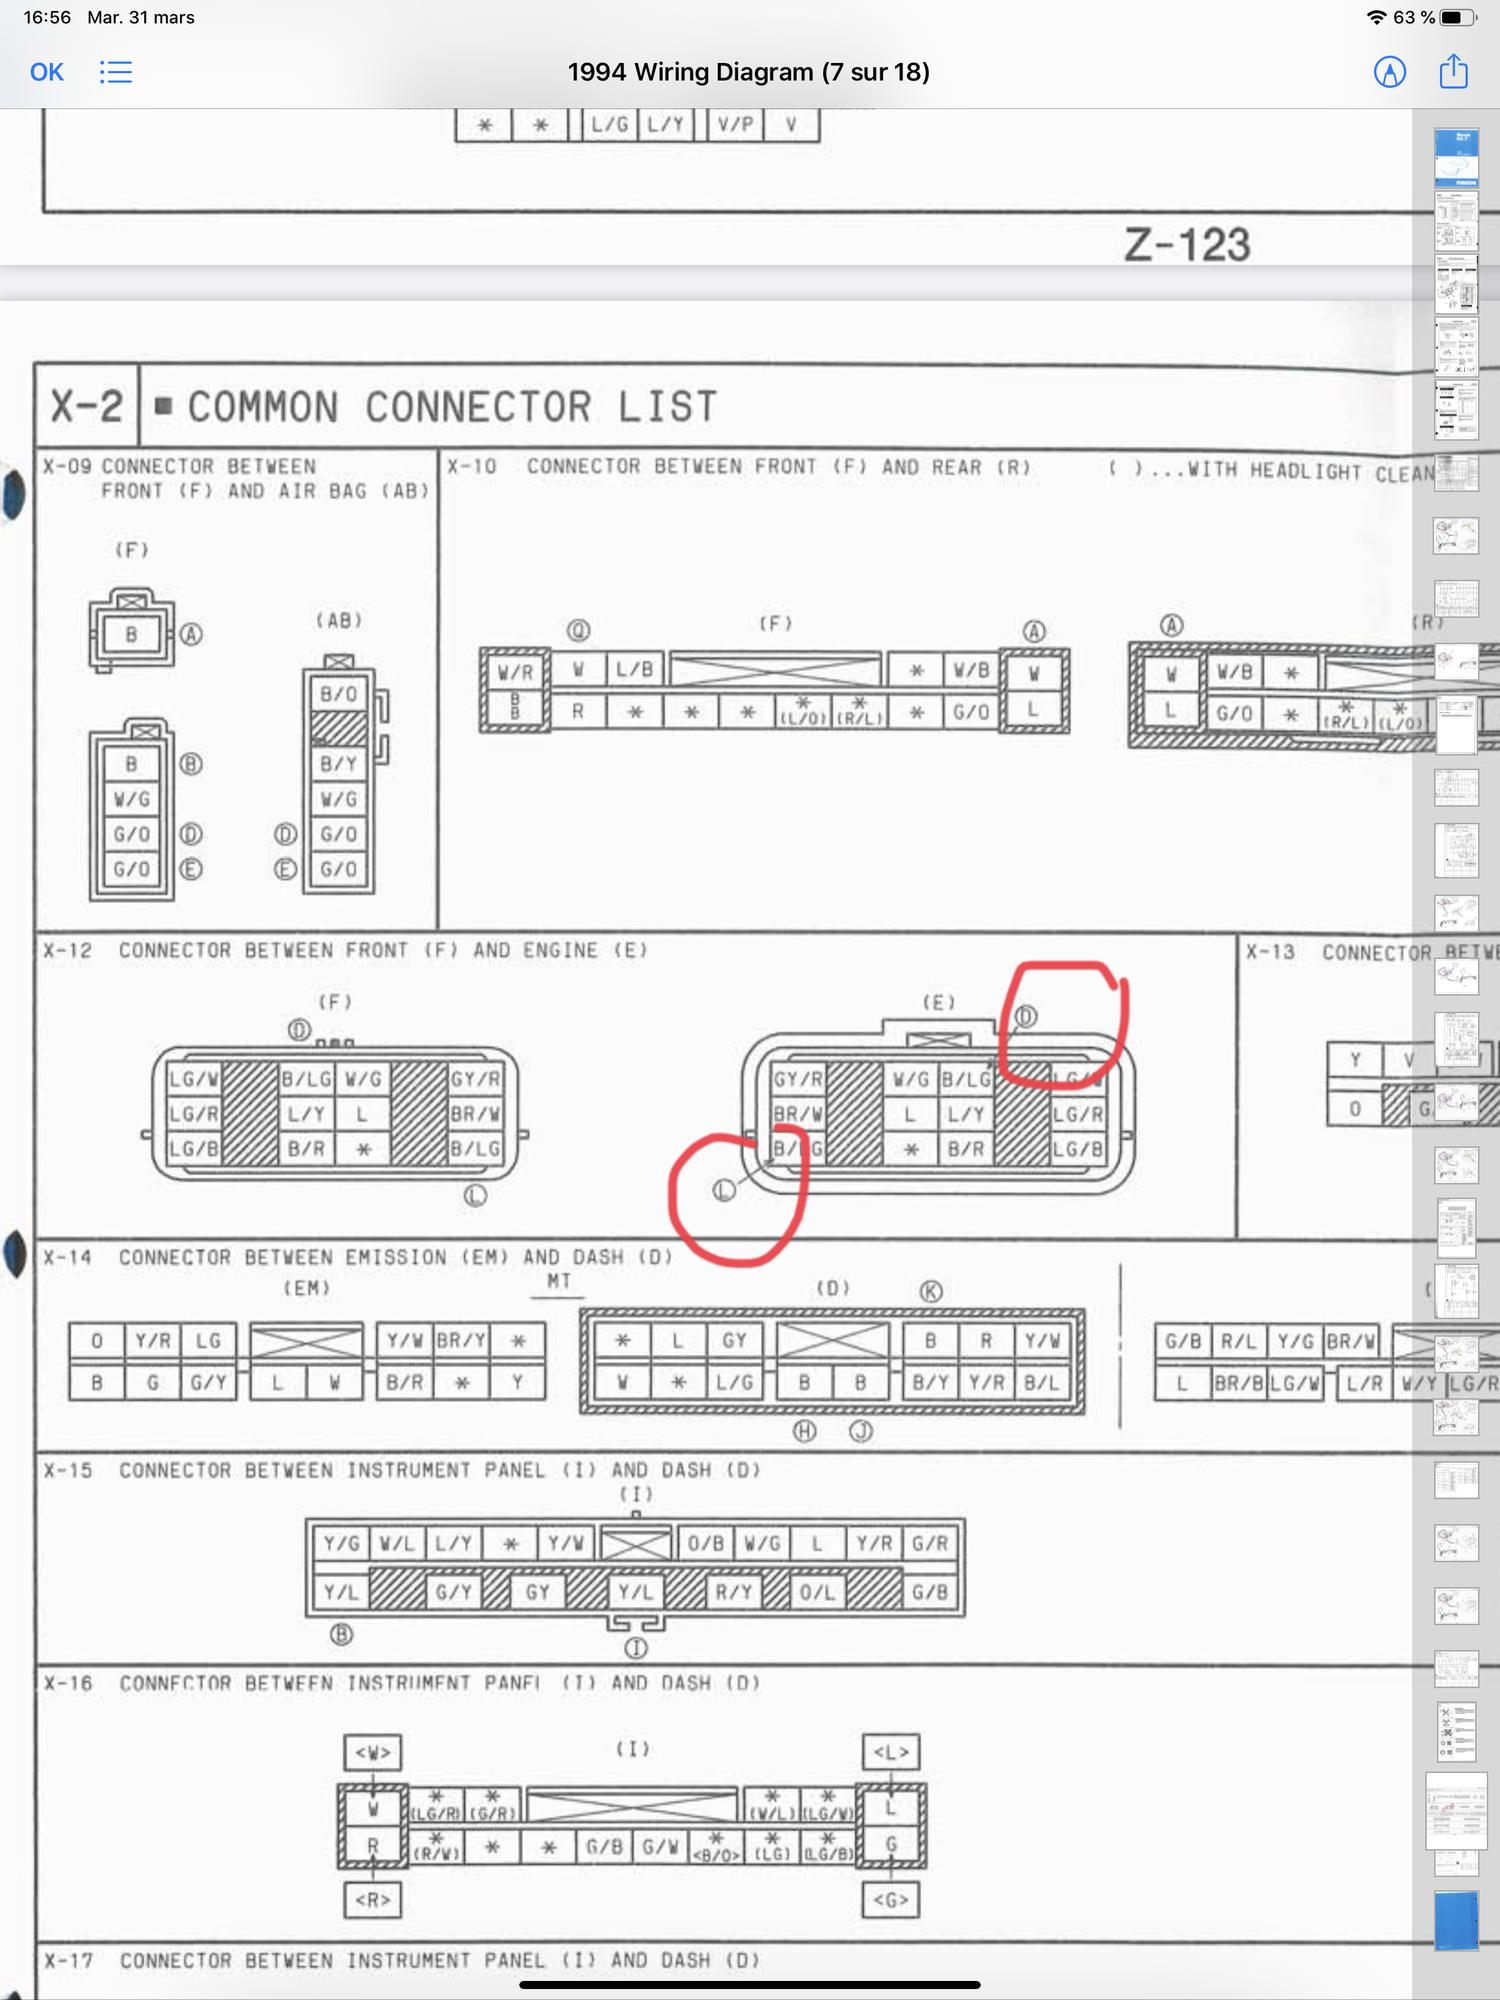 Wiring Diagram Explanation - Rx7club Com